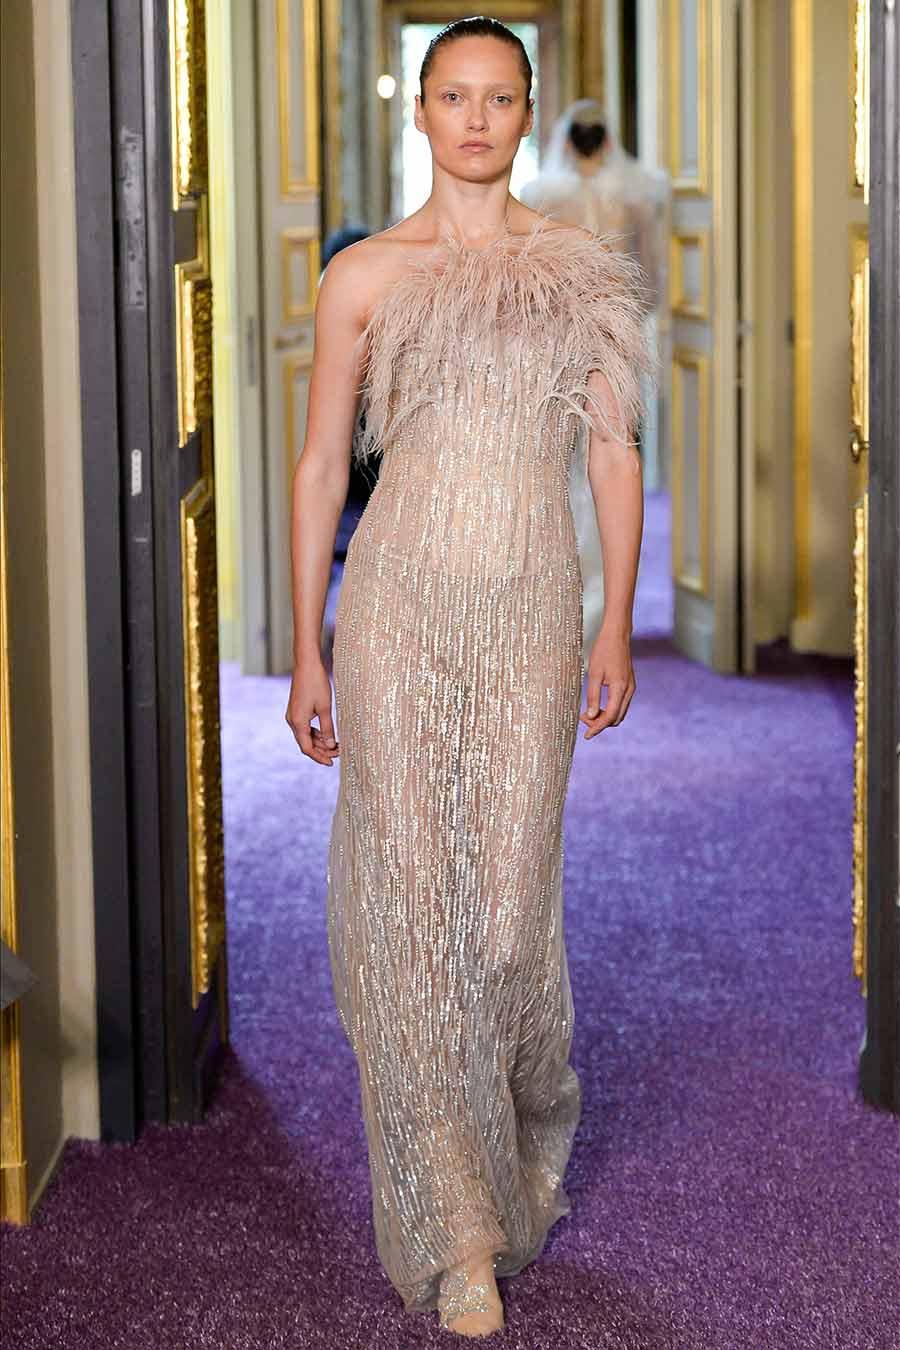 cristalli-look-shining-san-silvestro-francesco-scognamiglio-haute-couture-img3